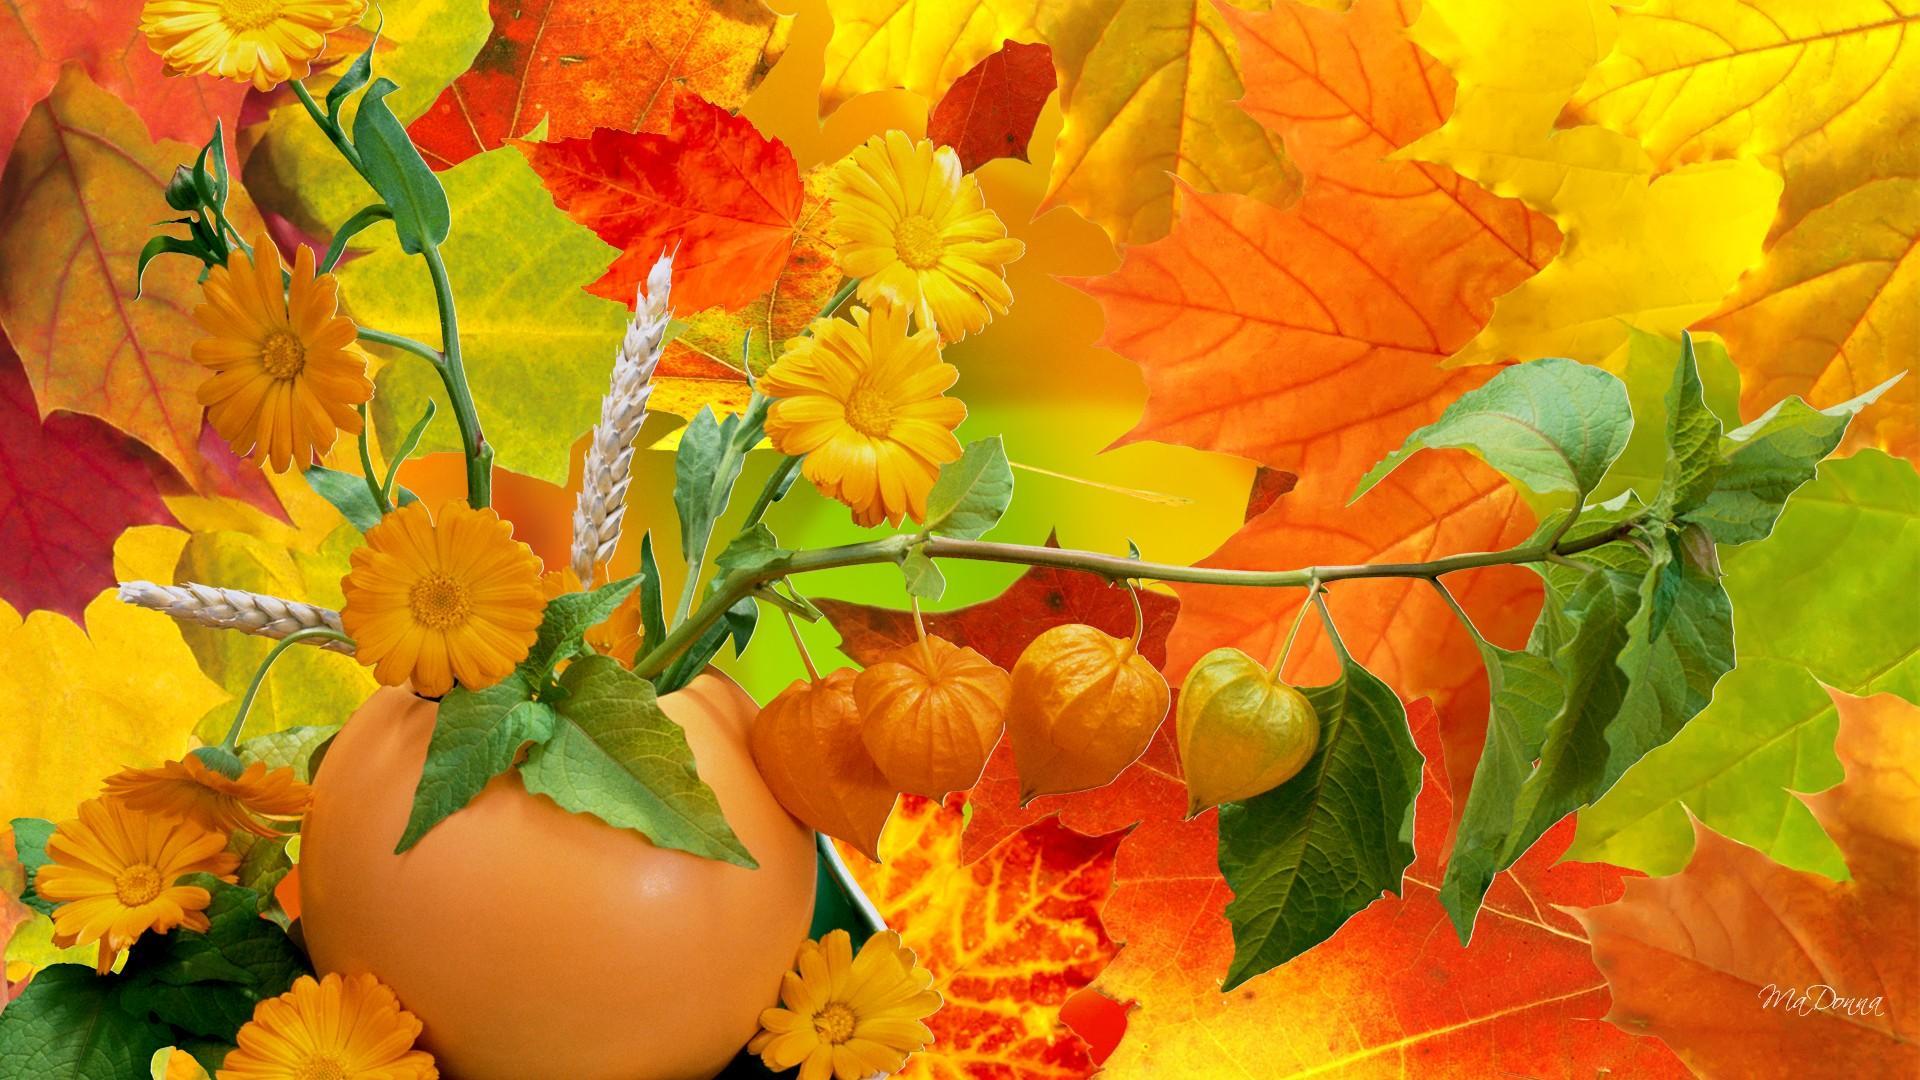 abundance-of-fall-colors-wallpaper-530eeb1727942.jpg